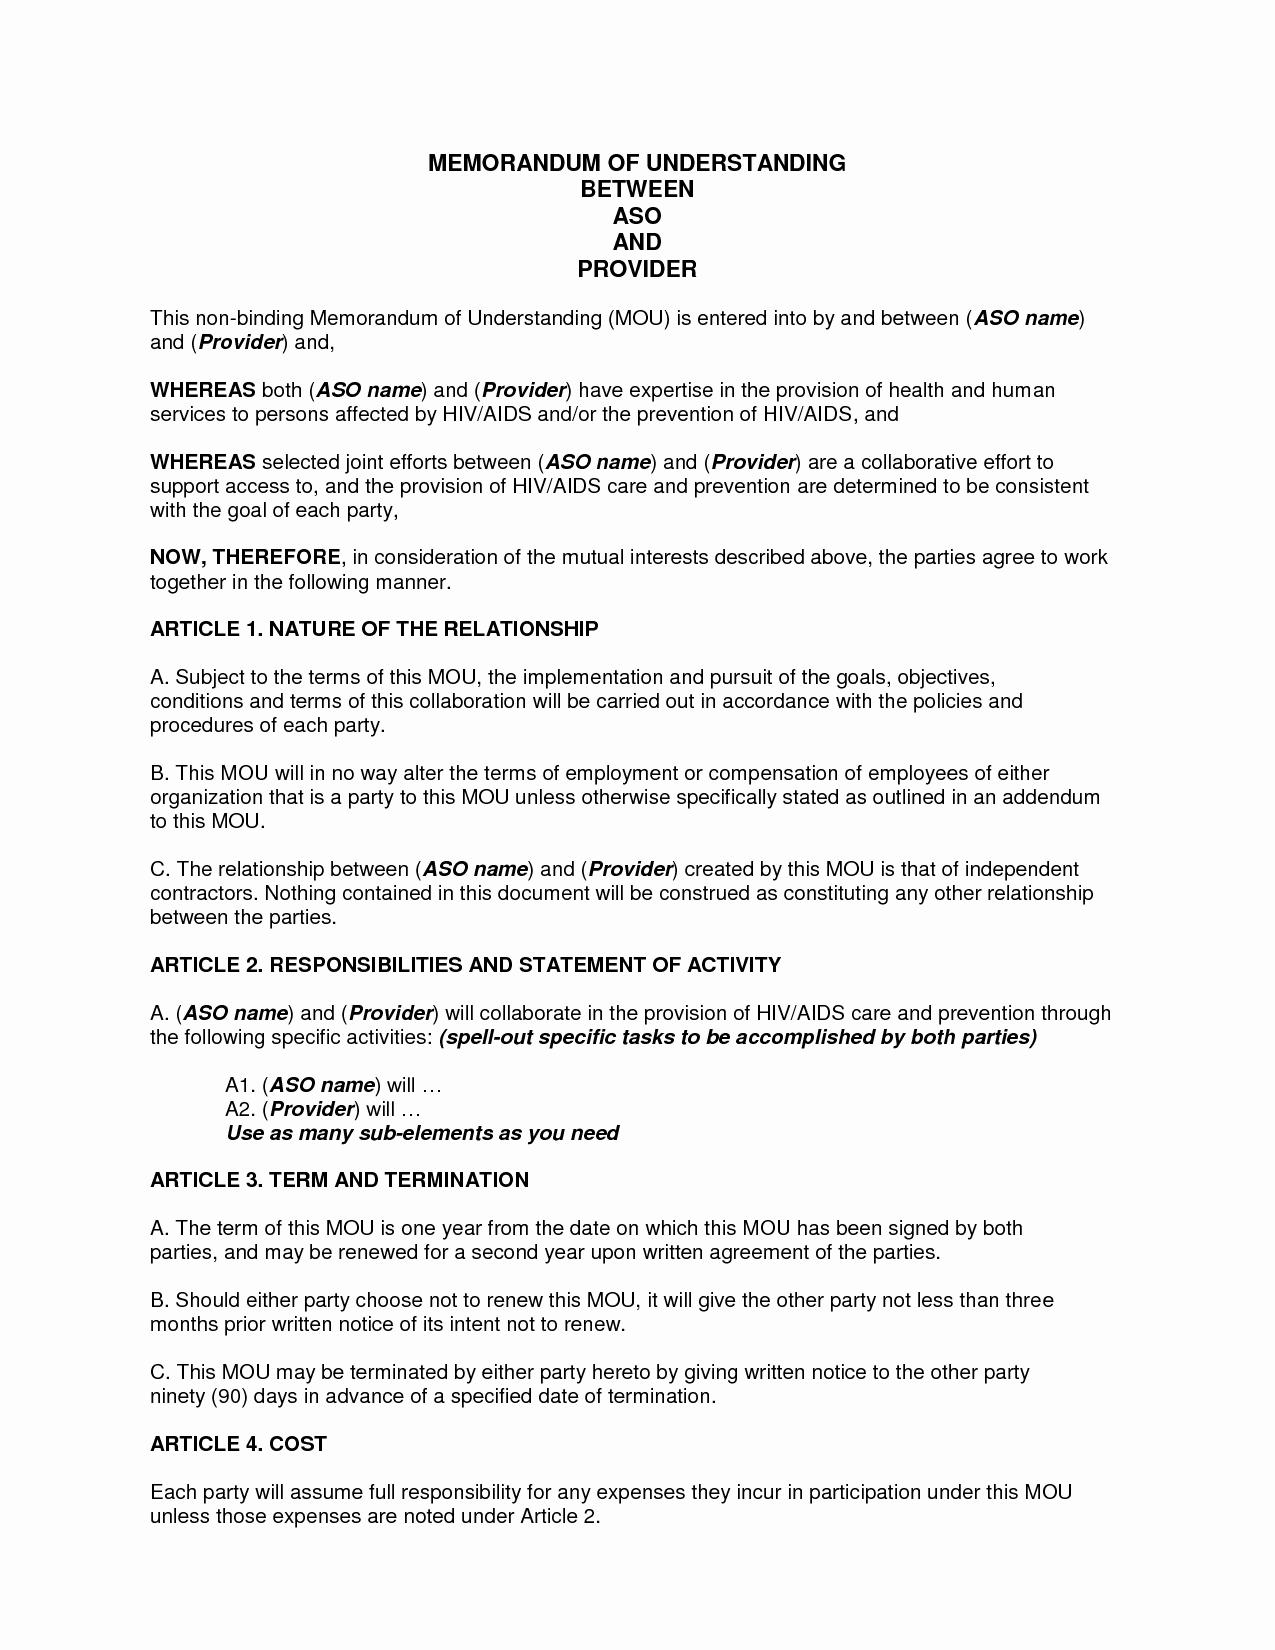 Memorandum Of Agreement Template Luxury Sample Memorandum Of Understanding Business Partnership